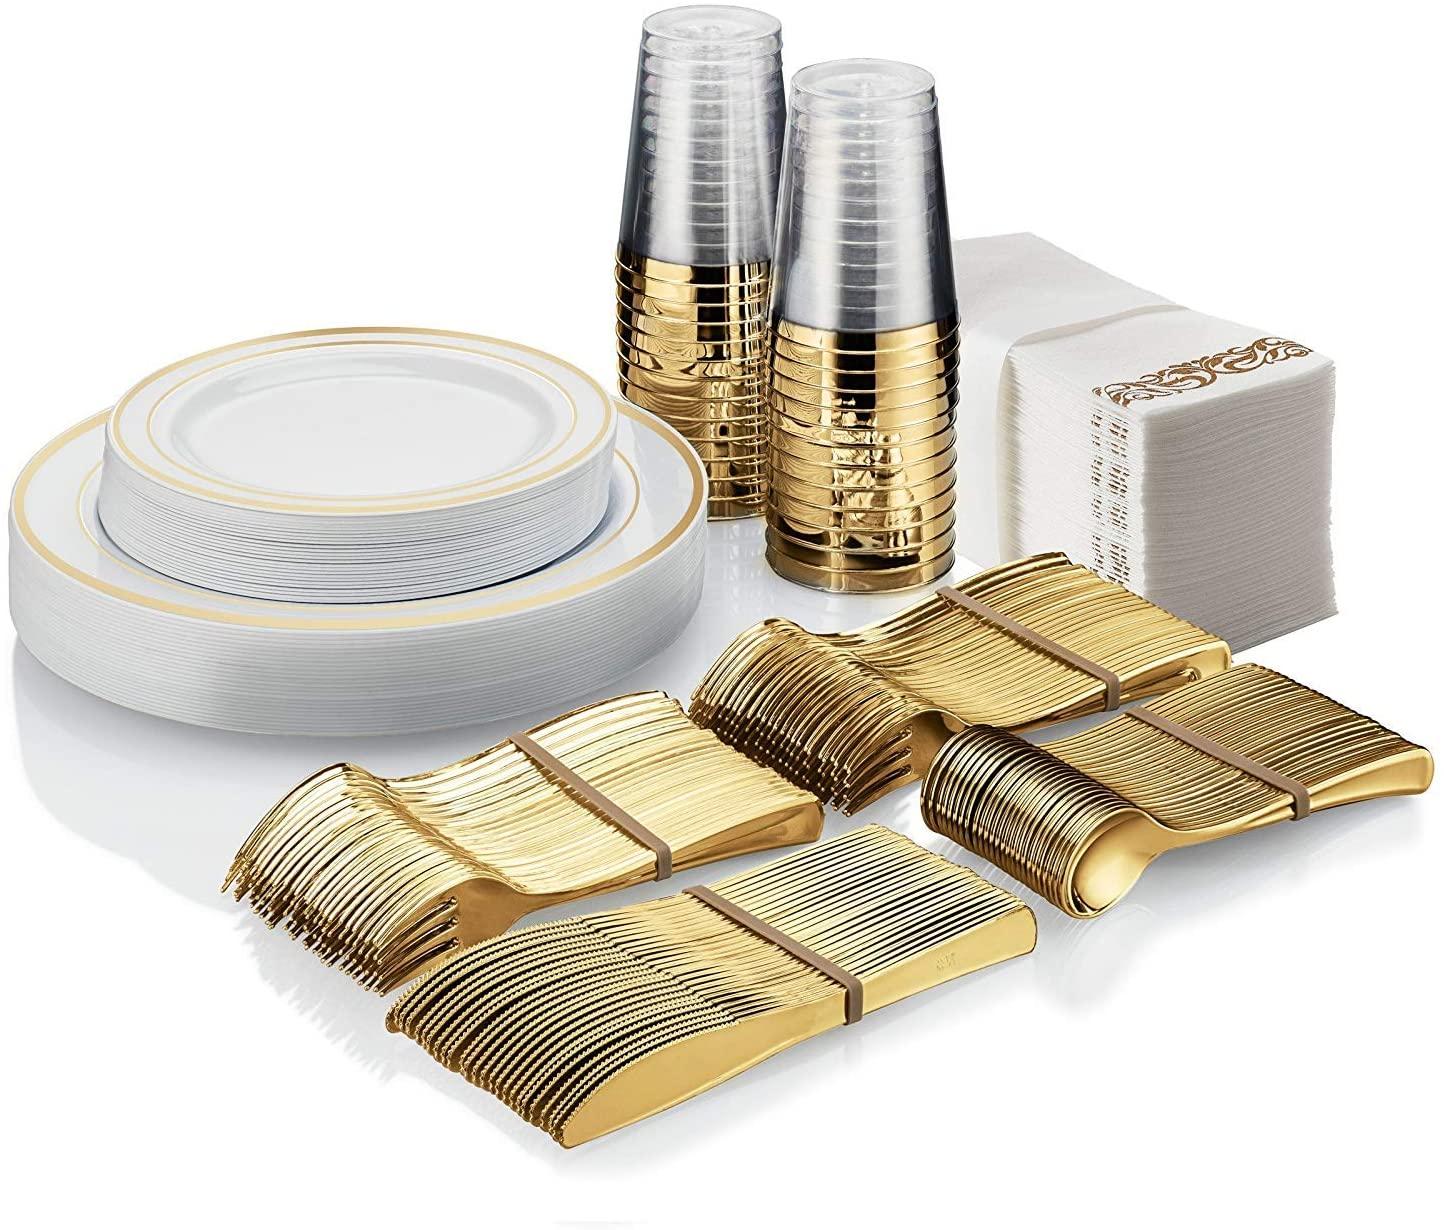 25 Guest Disposable Gold Plastic Dinnerware Set | 50 Forks, 25 Spoons, 25 Dessert Spoons, 25 Knives, 25 Dinner Plates, 25 Dessert Plates & 25 Gold Rimmed Cups | Bonus 50 Guest Towels